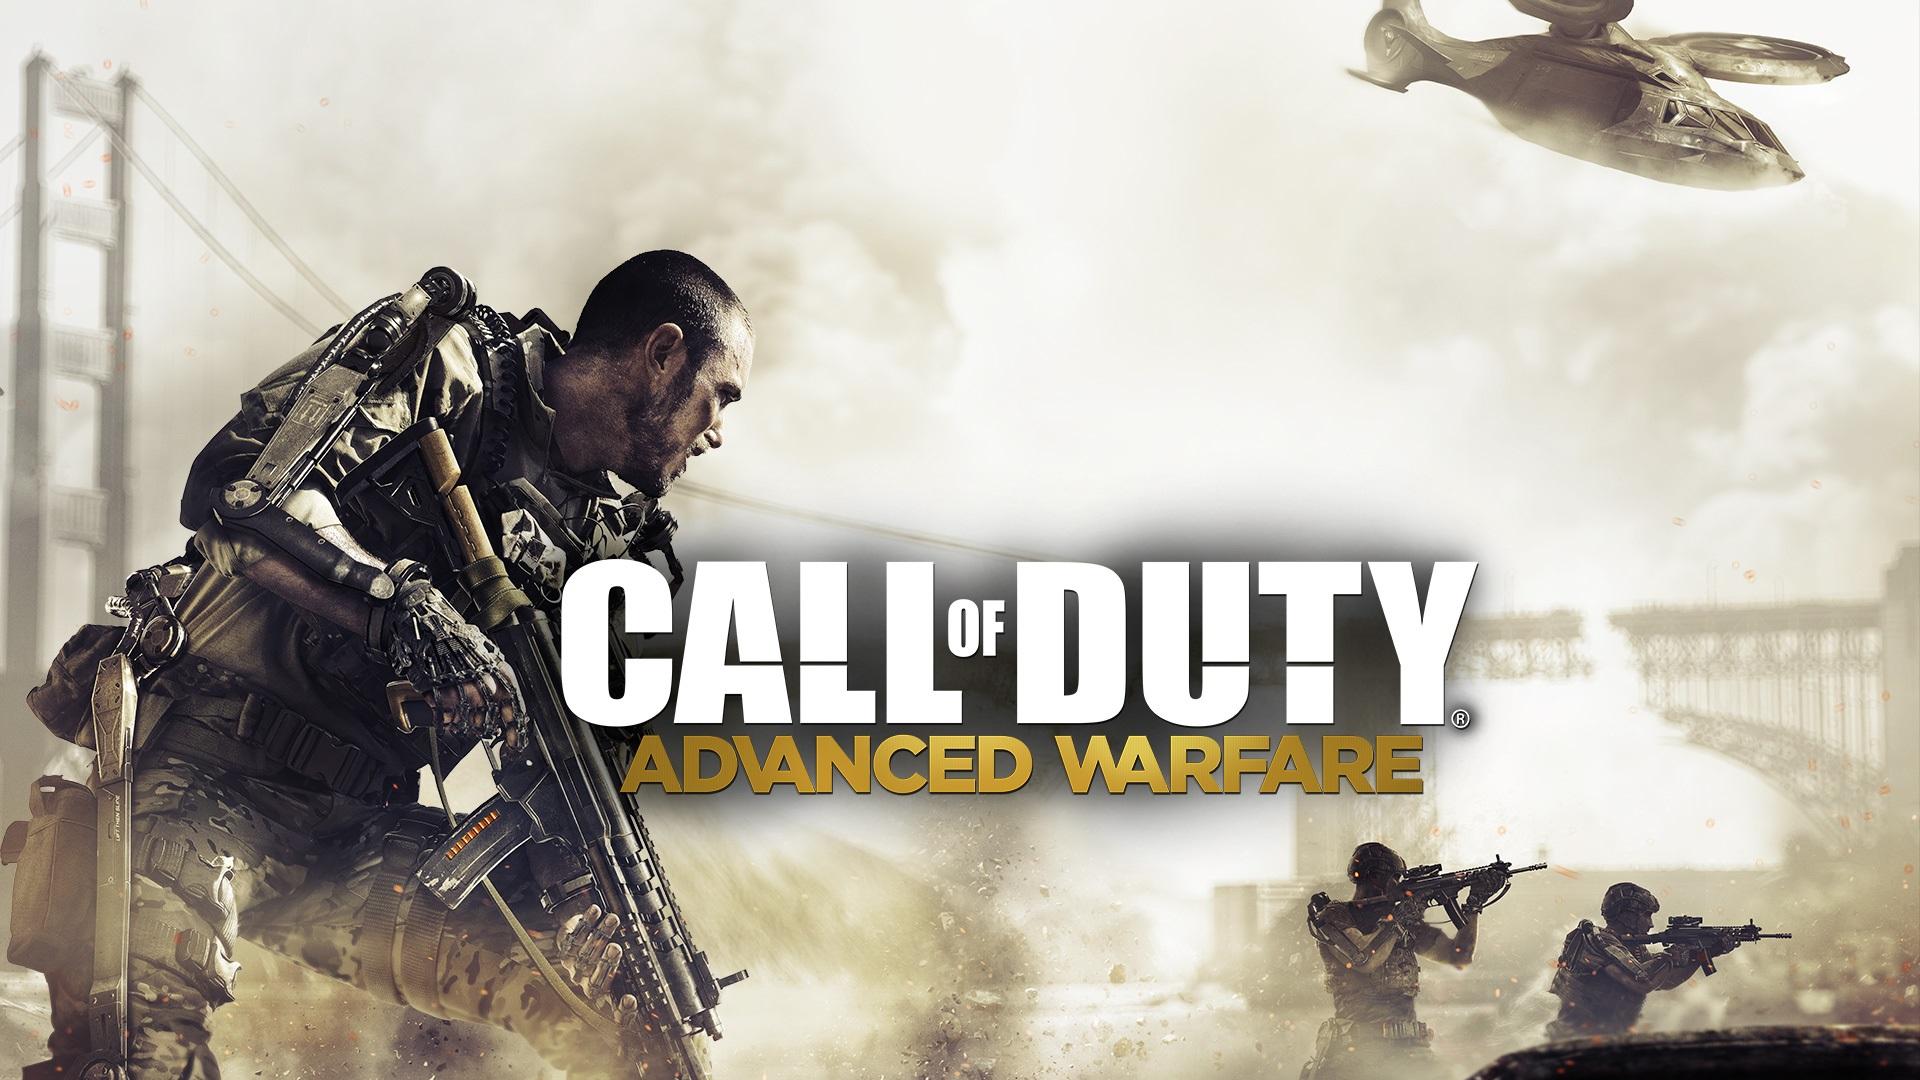 Media Create Top 20 Call of Duty Advanced Warfare